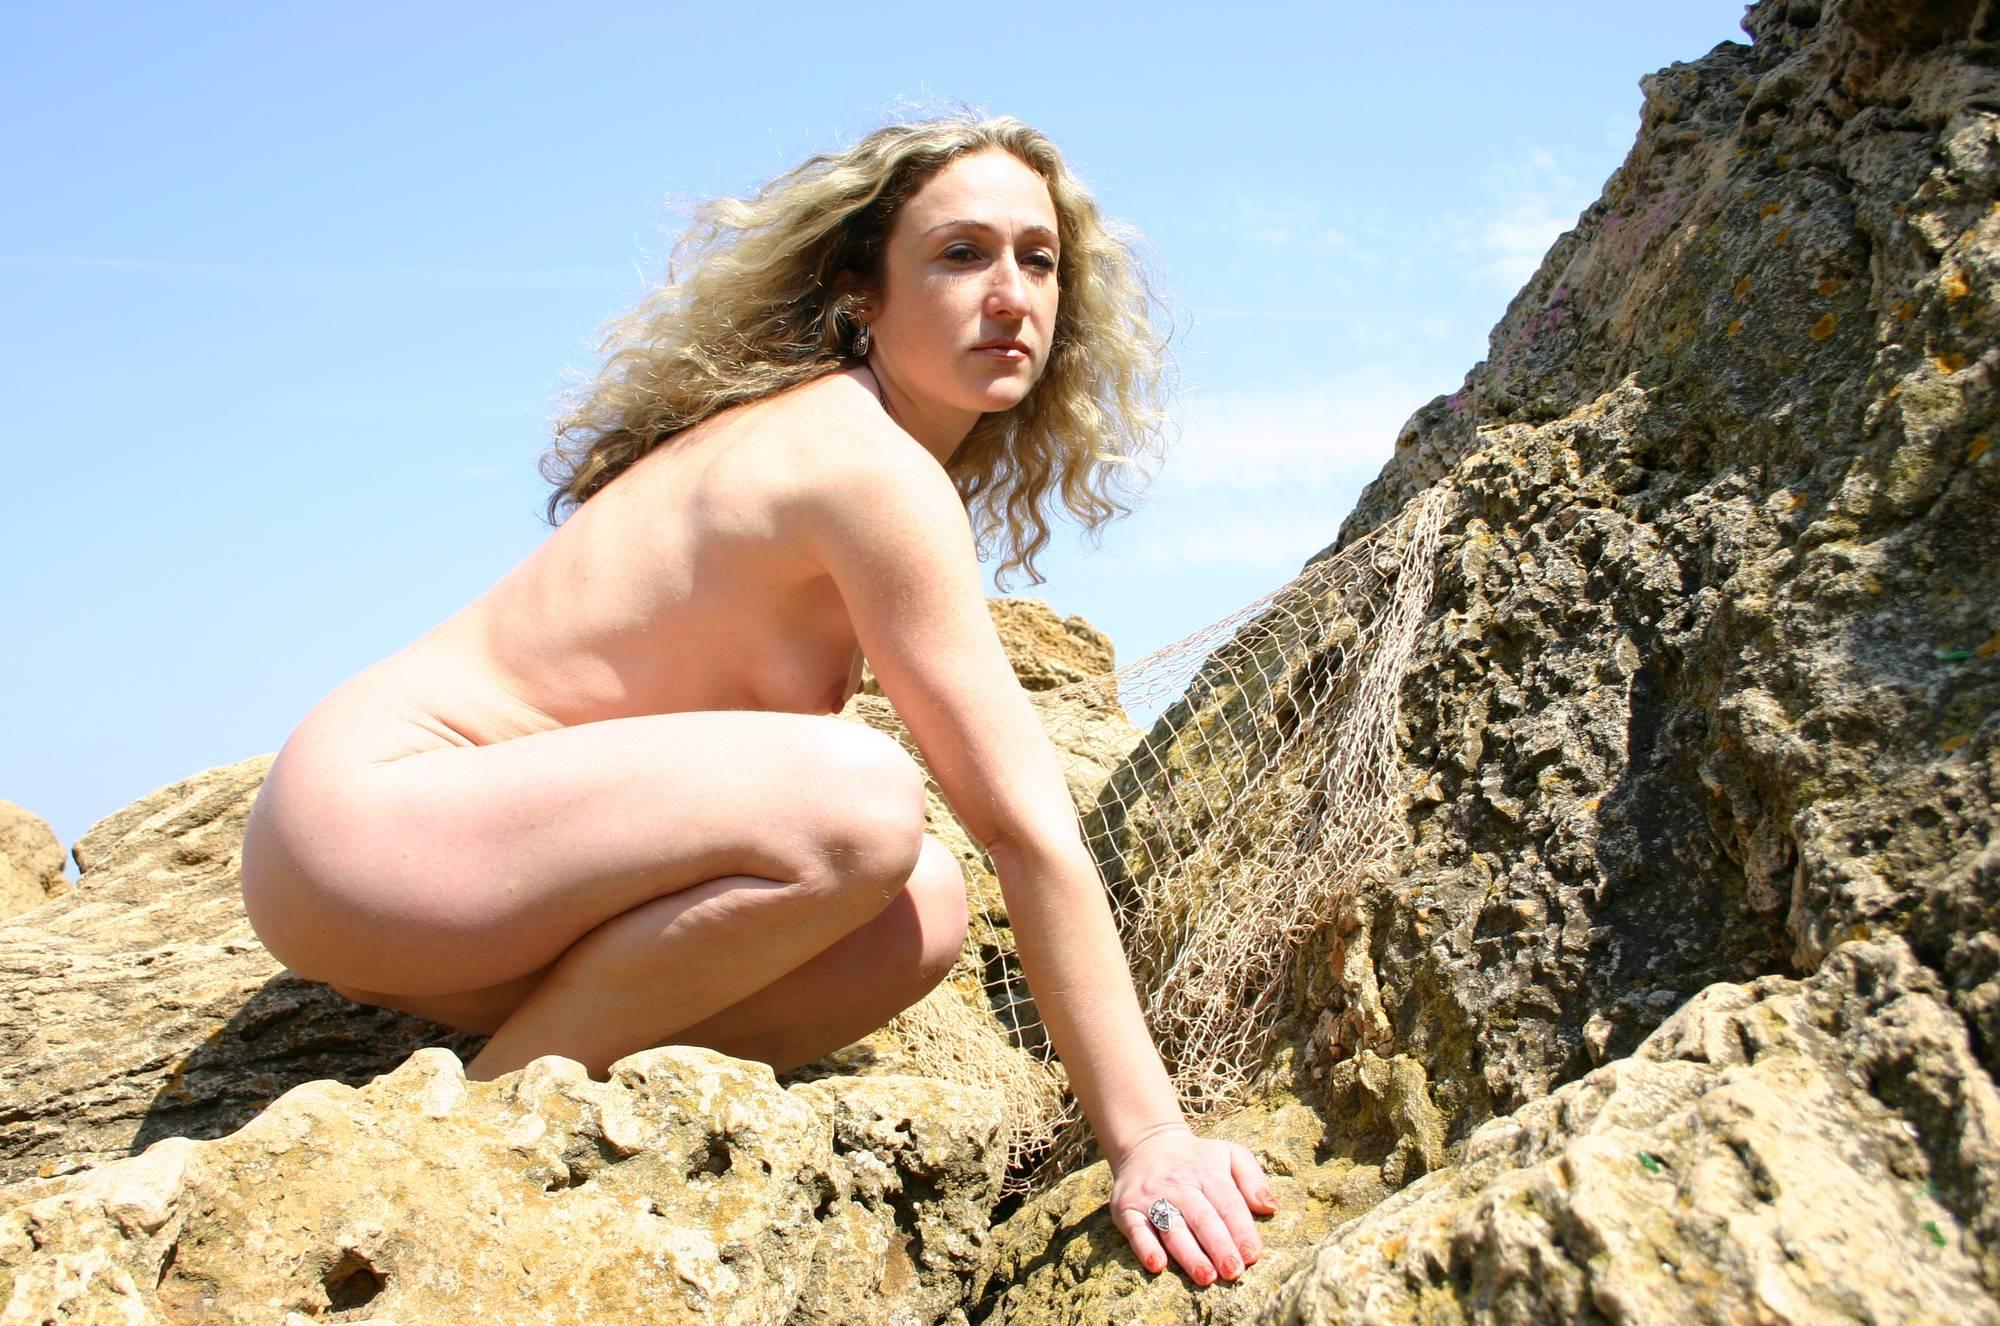 Purenudism Photos-Mother Nude Mountain Net - 2